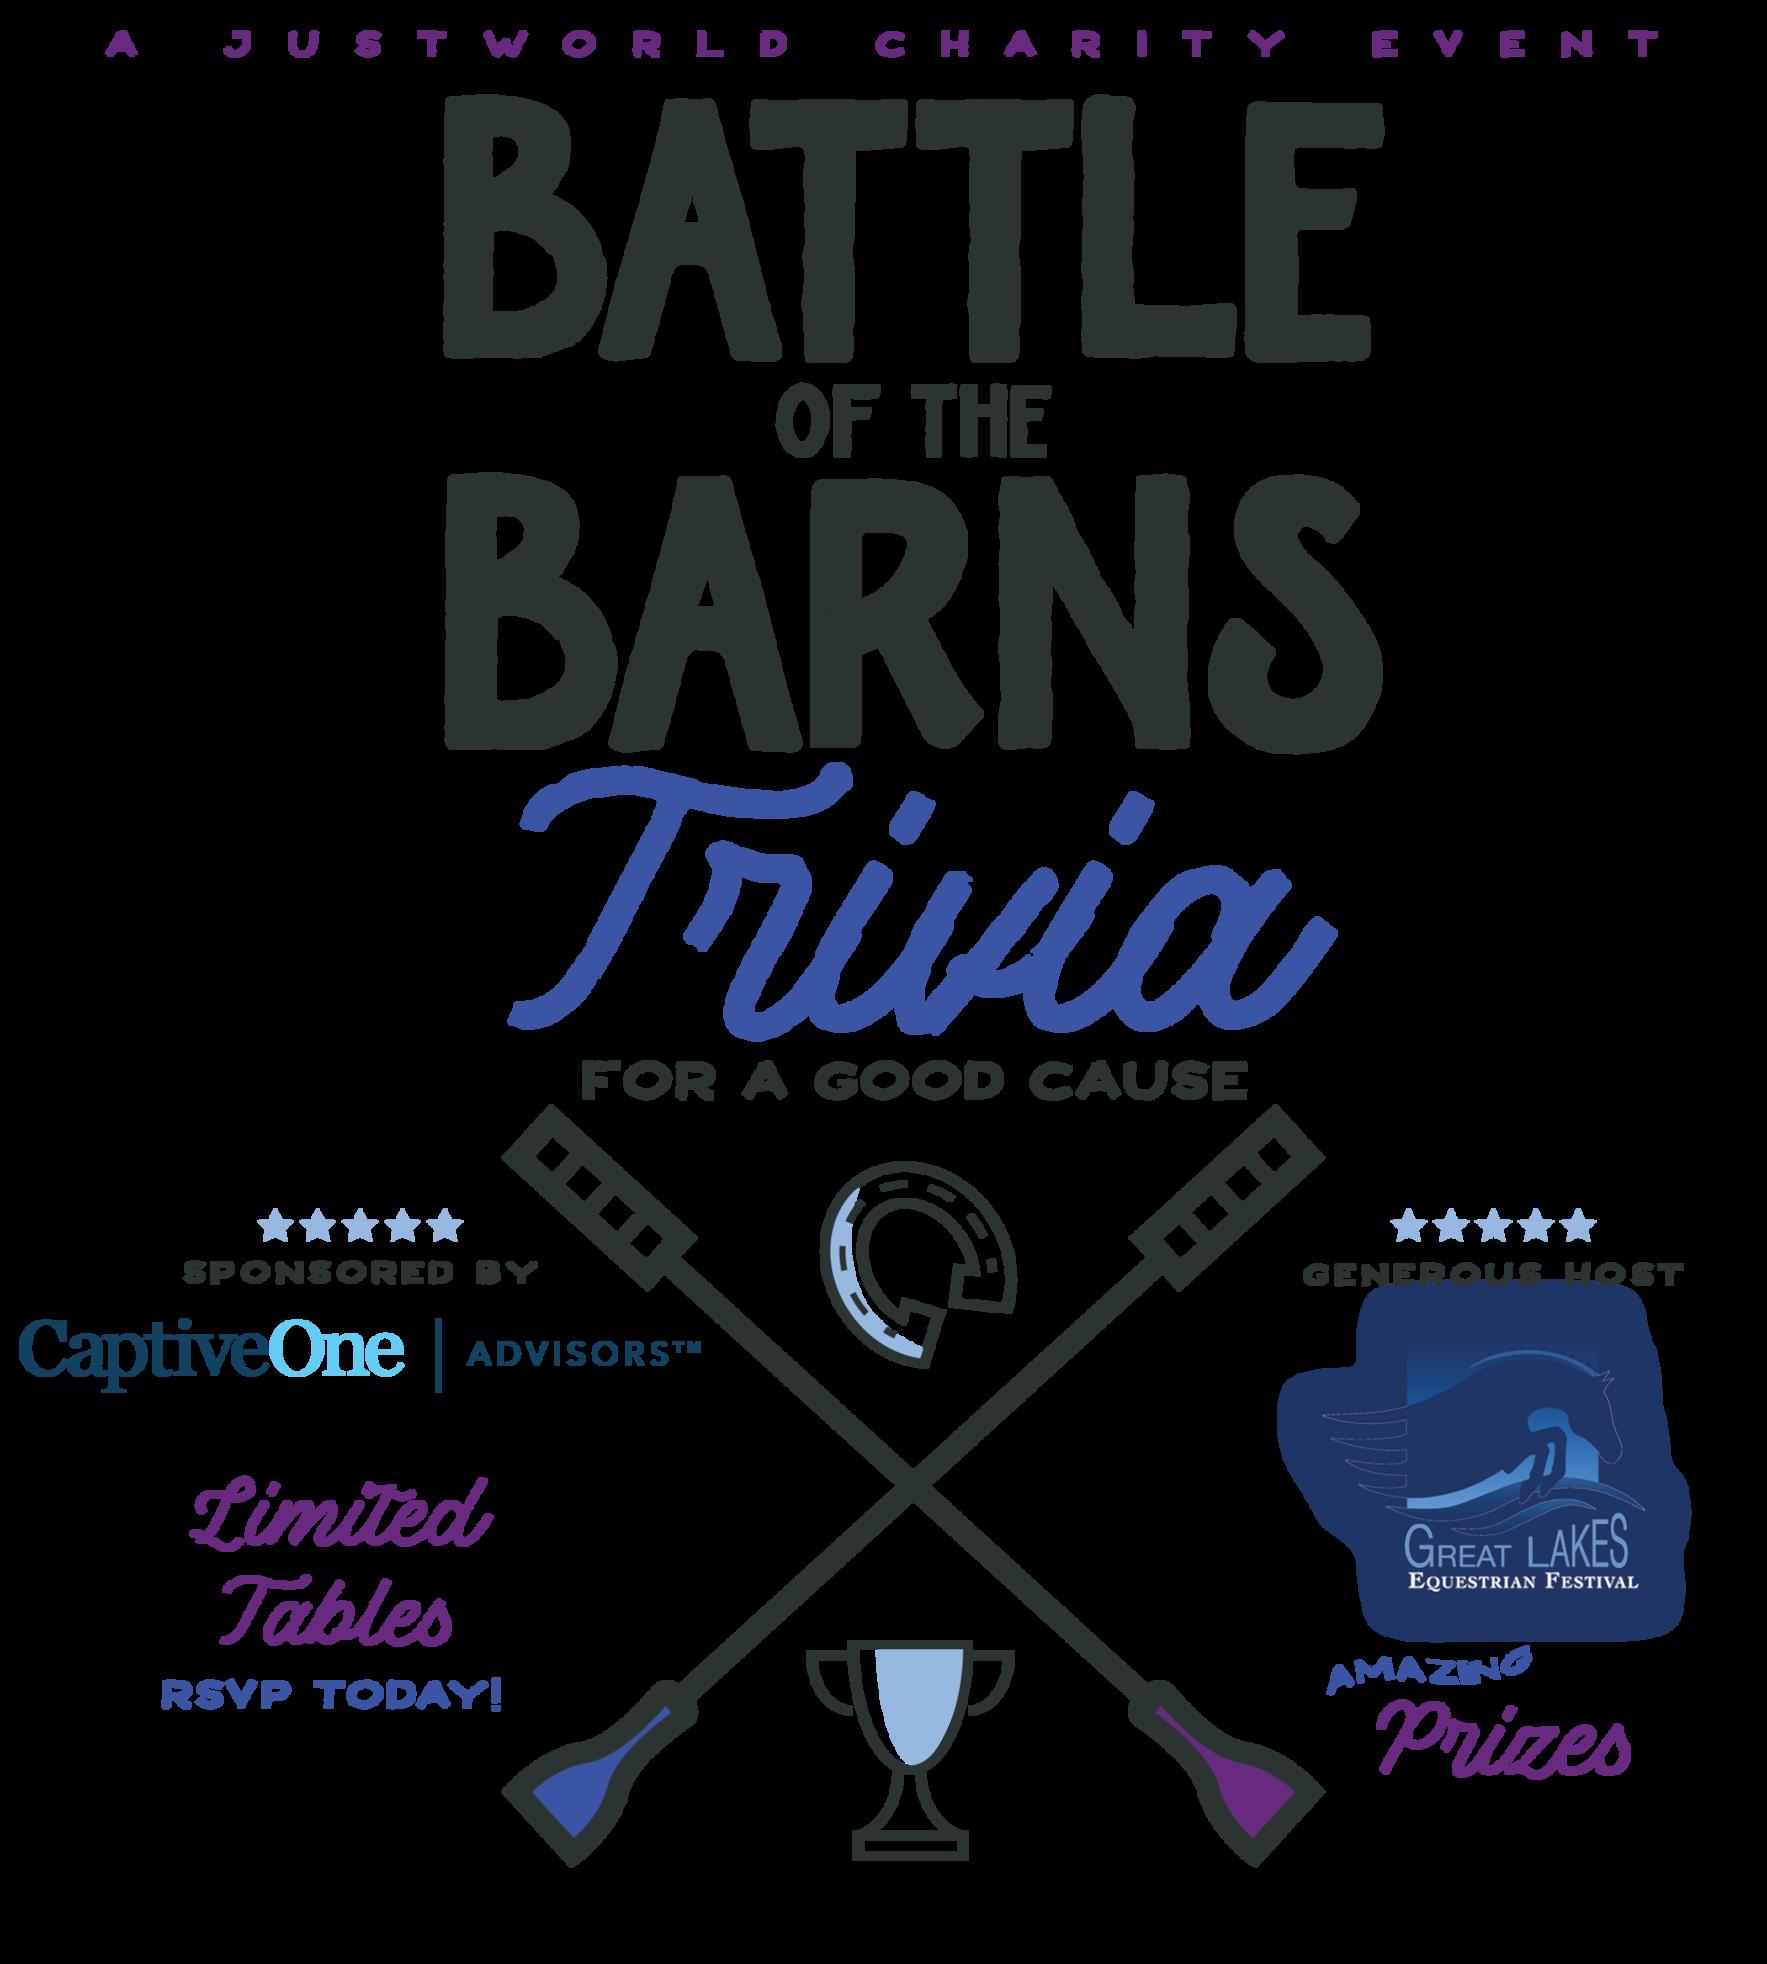 JustWorld & CaptiveOne Battle of the Barns Trivia Night  image